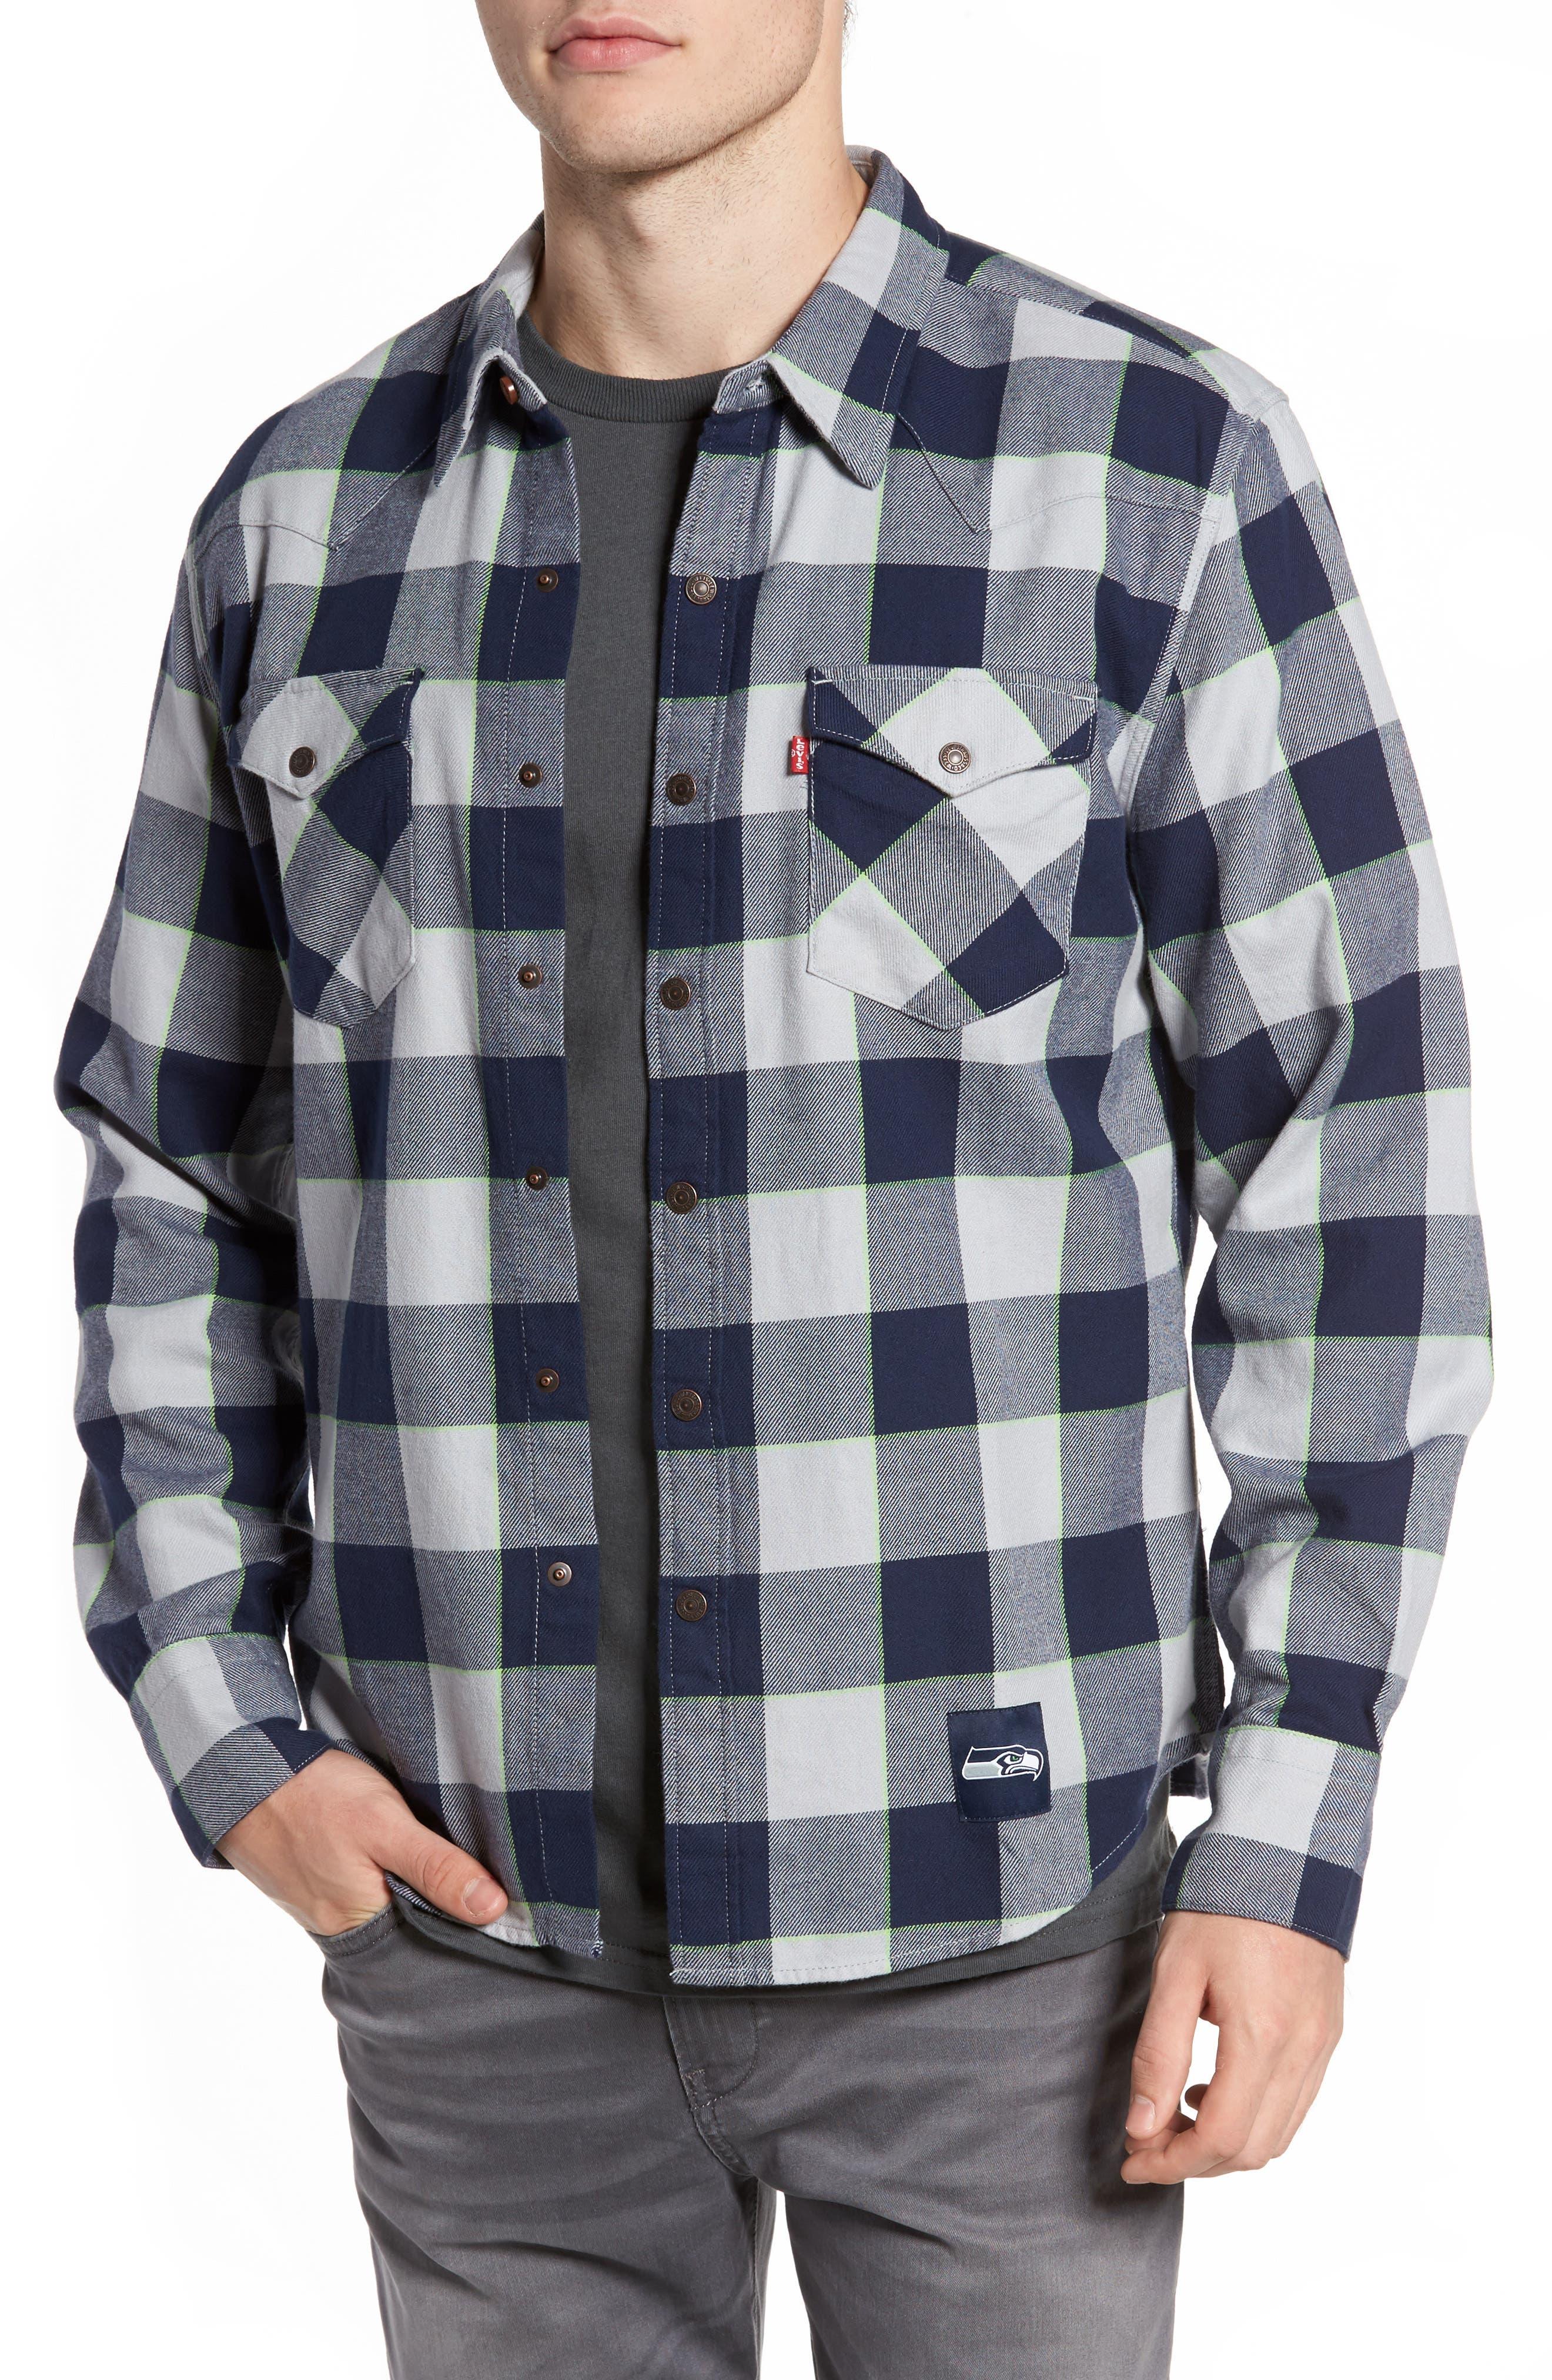 Levi's® NFL Seahawks - Barstow Plaid Western Shirt